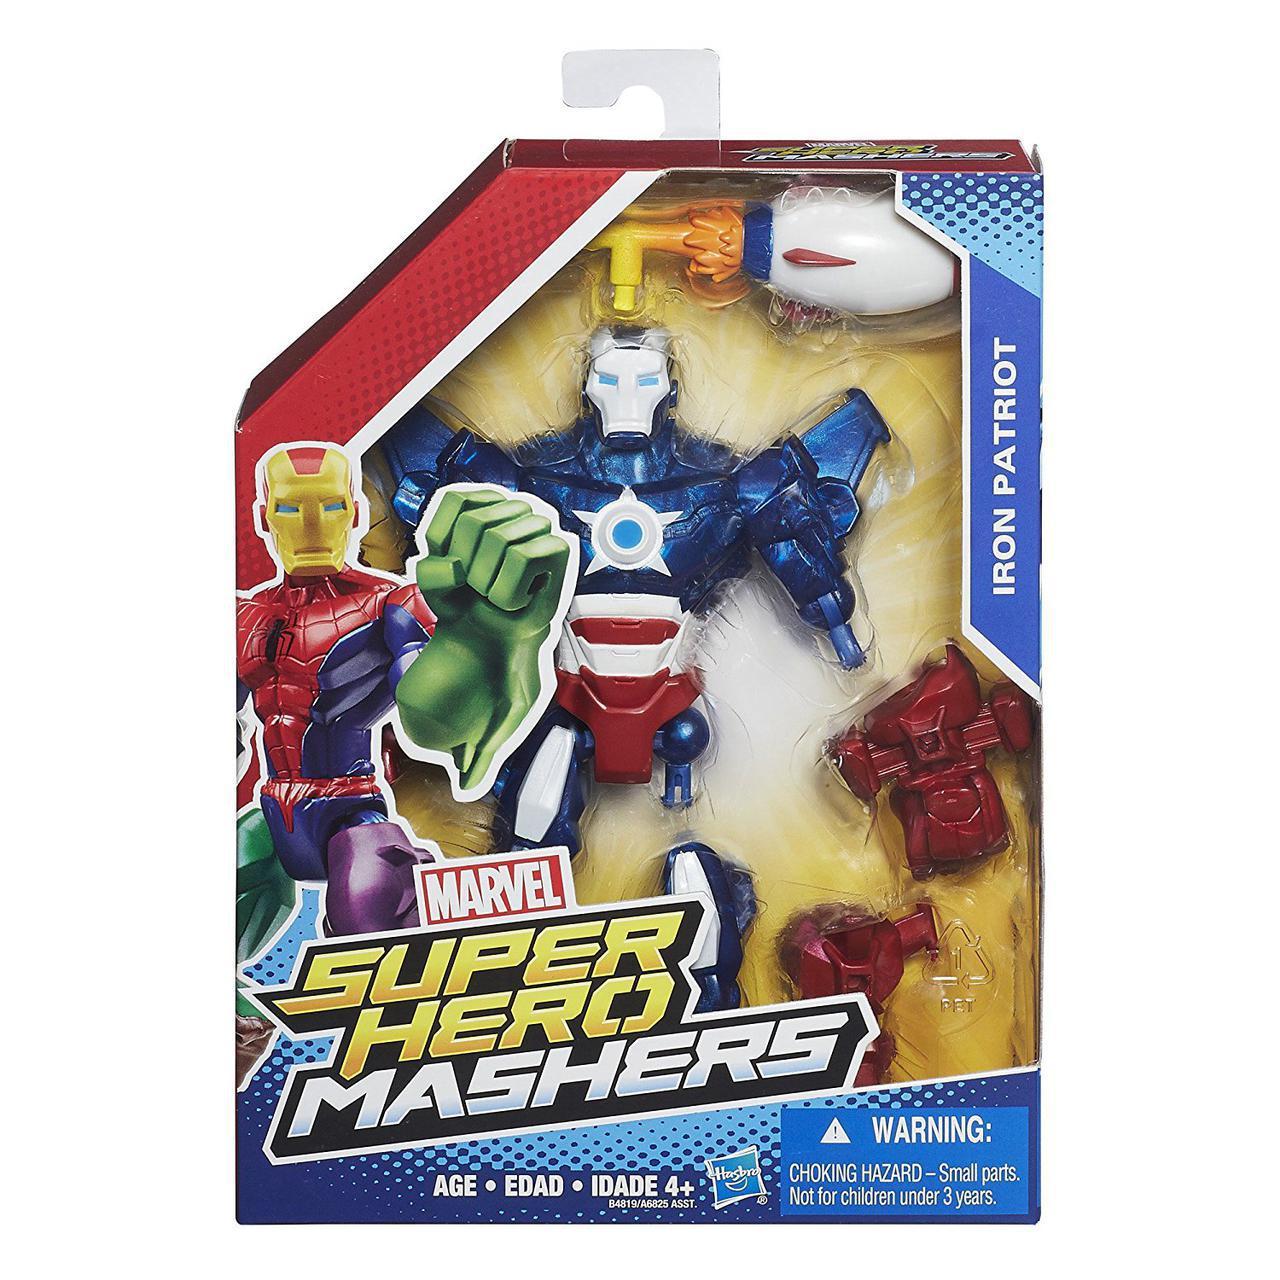 Разборная фигурка супергероя  Железный Патриот - Iron Patriot, Marvel, Mashers, Hasbro